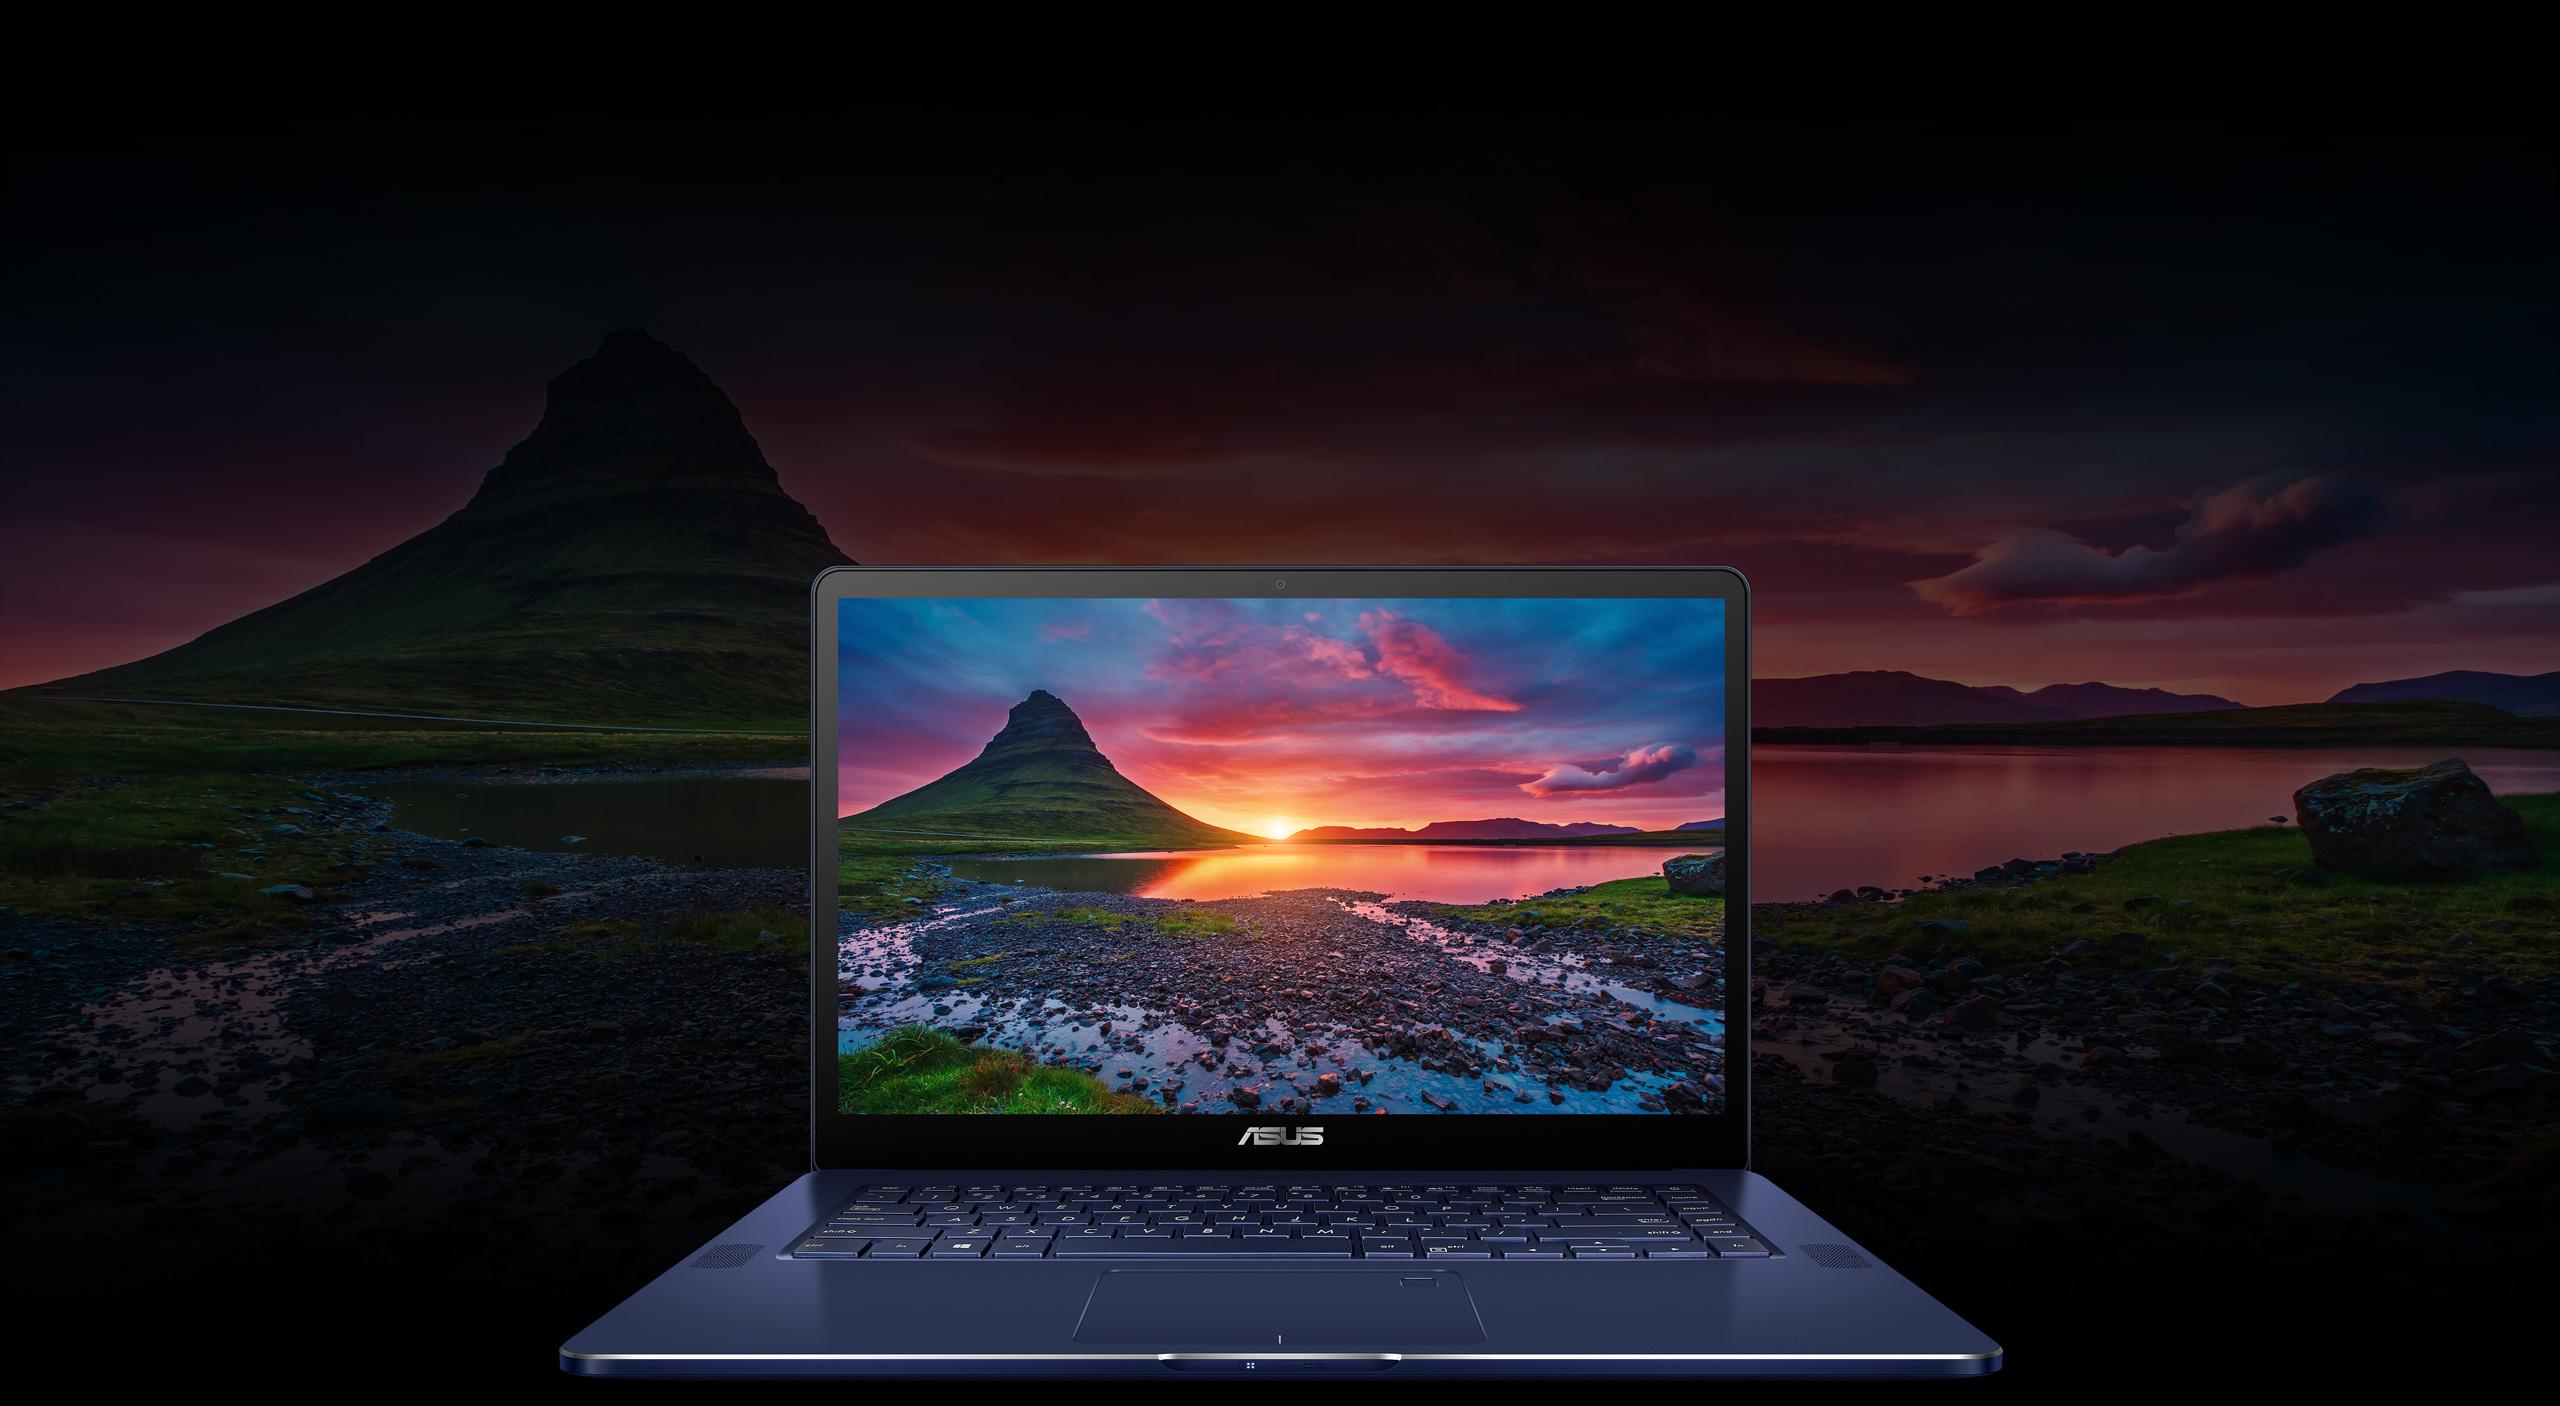 ZenBook_Pro_UX550_01